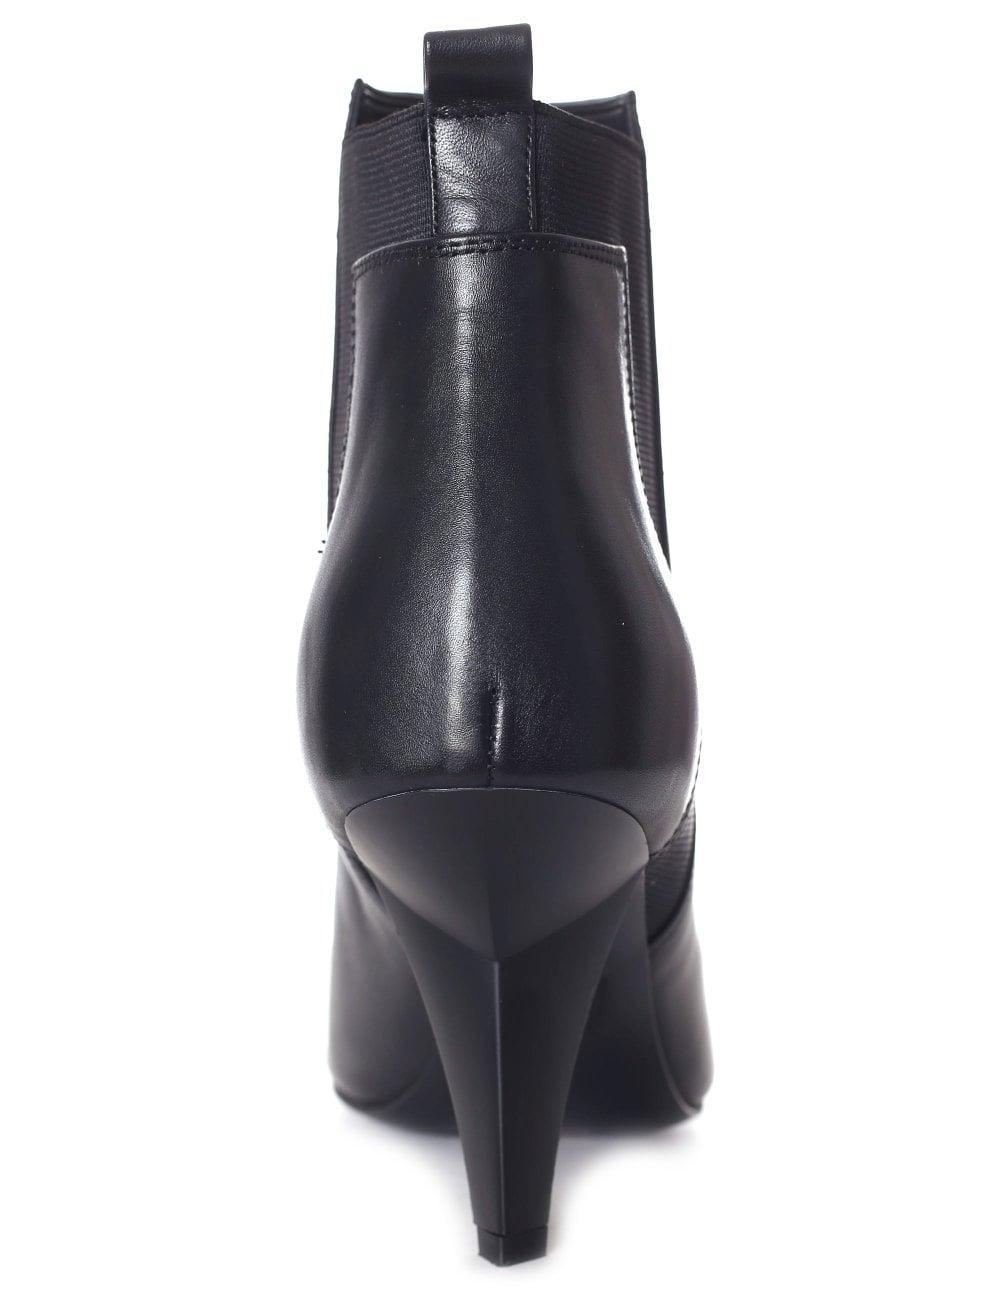 Boot Kylie Leather Mid Viva Length Kendallamp; Women's Ankle 0PnwOk